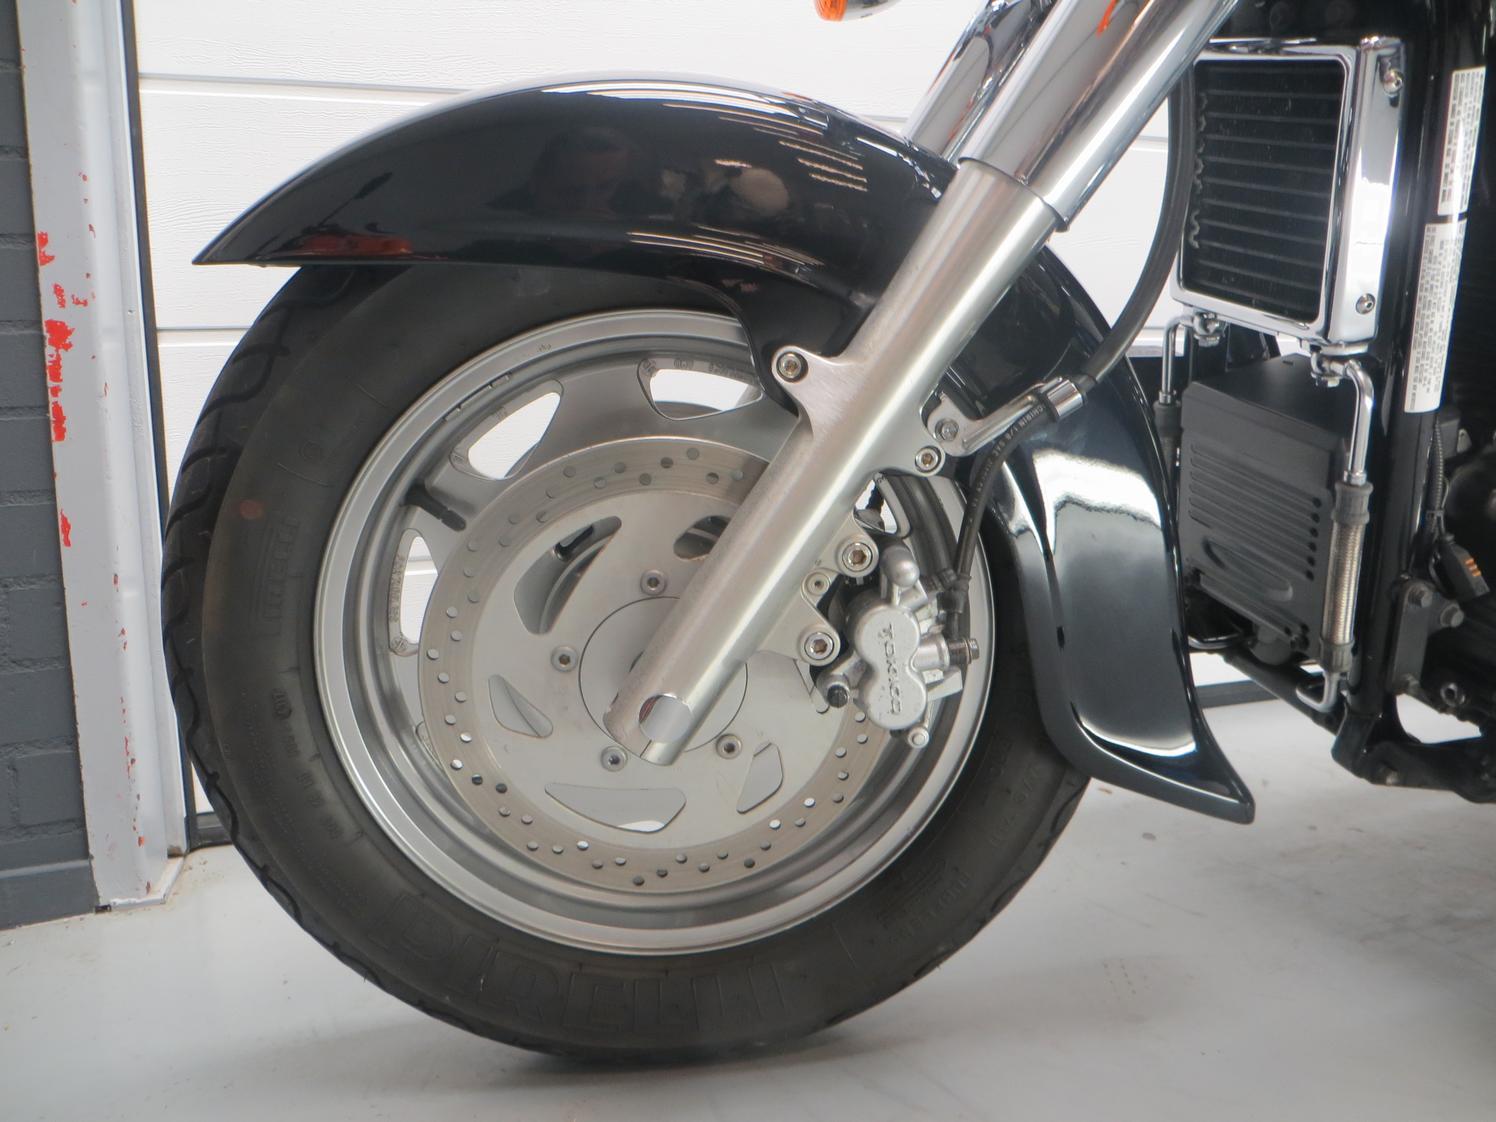 Te Koop: SUZUKI VL 1500 INTRUDER BOULEVARD - BikeNet